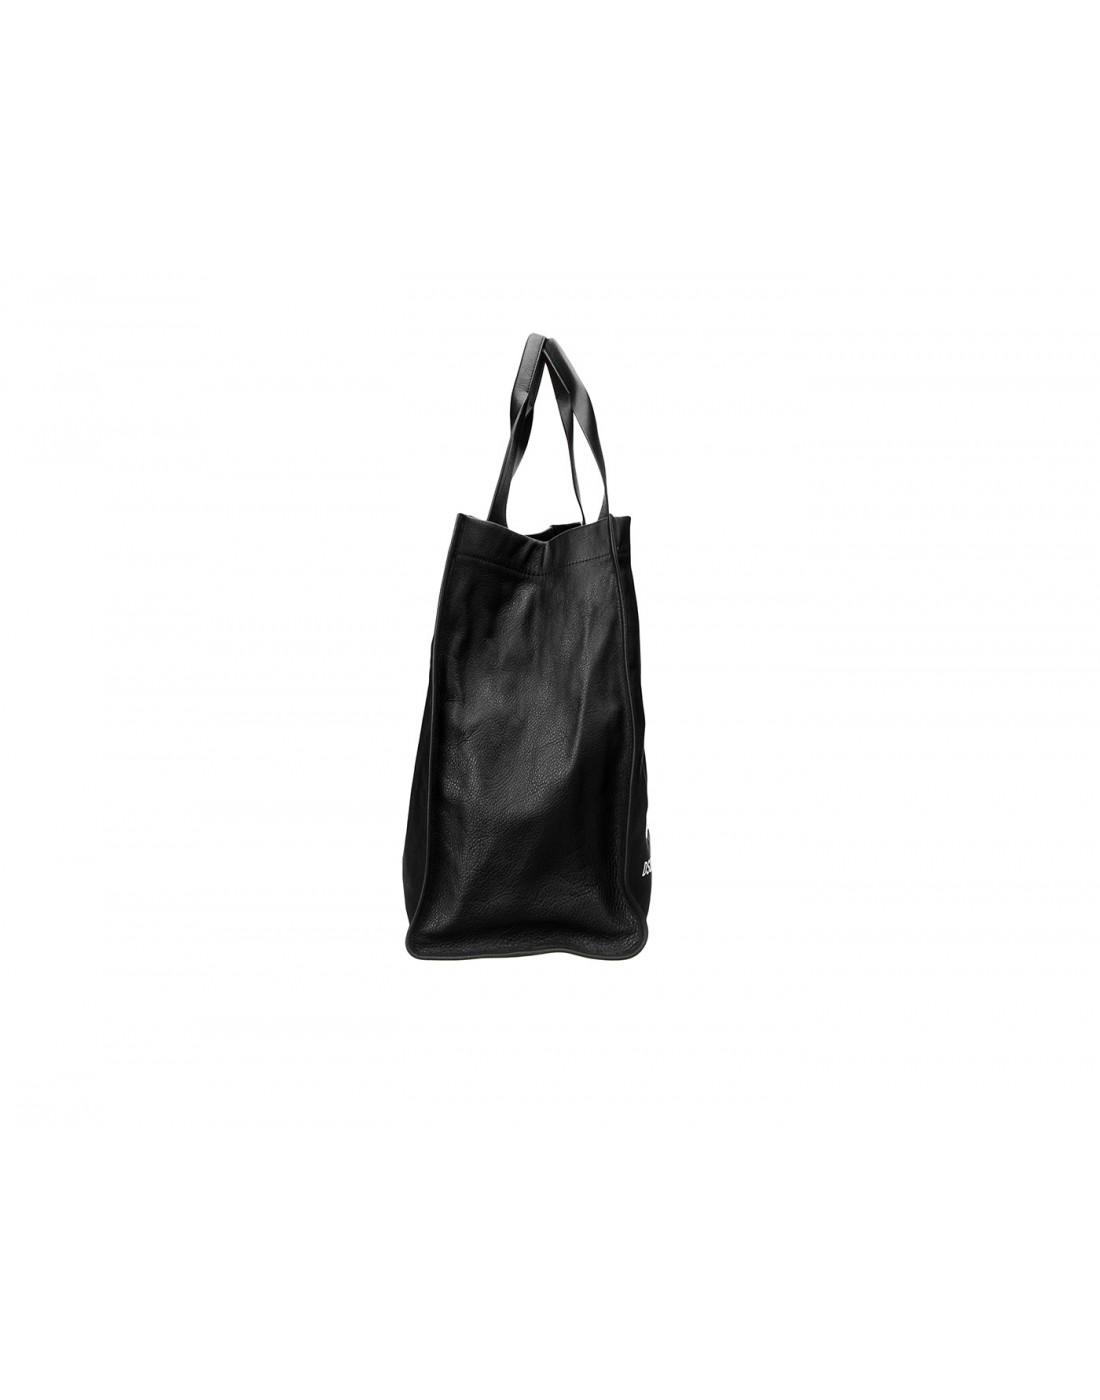 Сумка-шопер черная женская Dsquared2 SSPW0022.M063-3